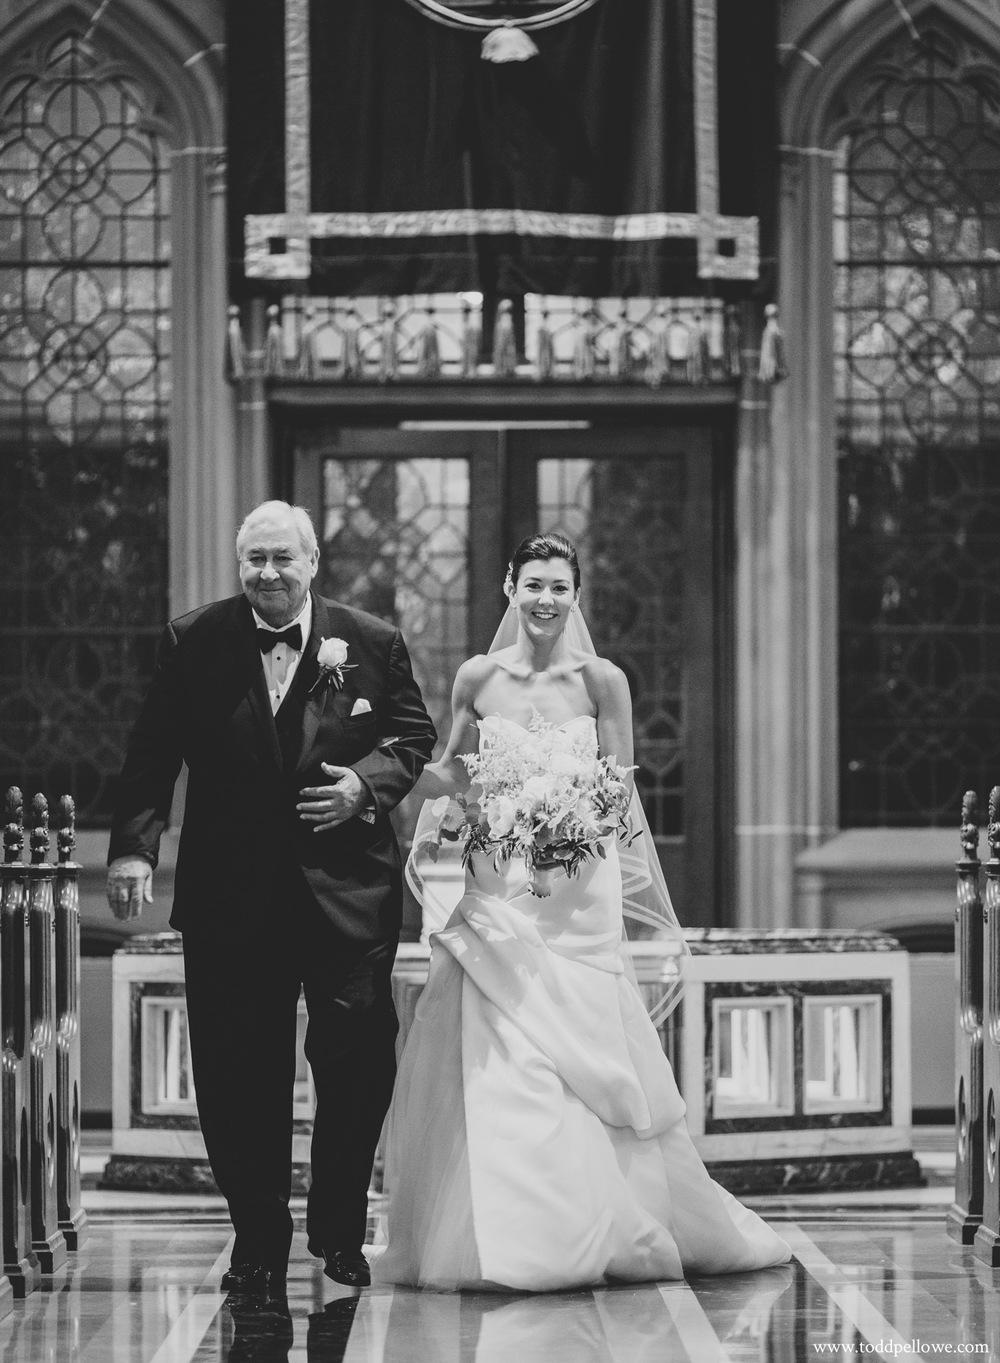 22-kentucky-farm-wedding-photography-304.jpg